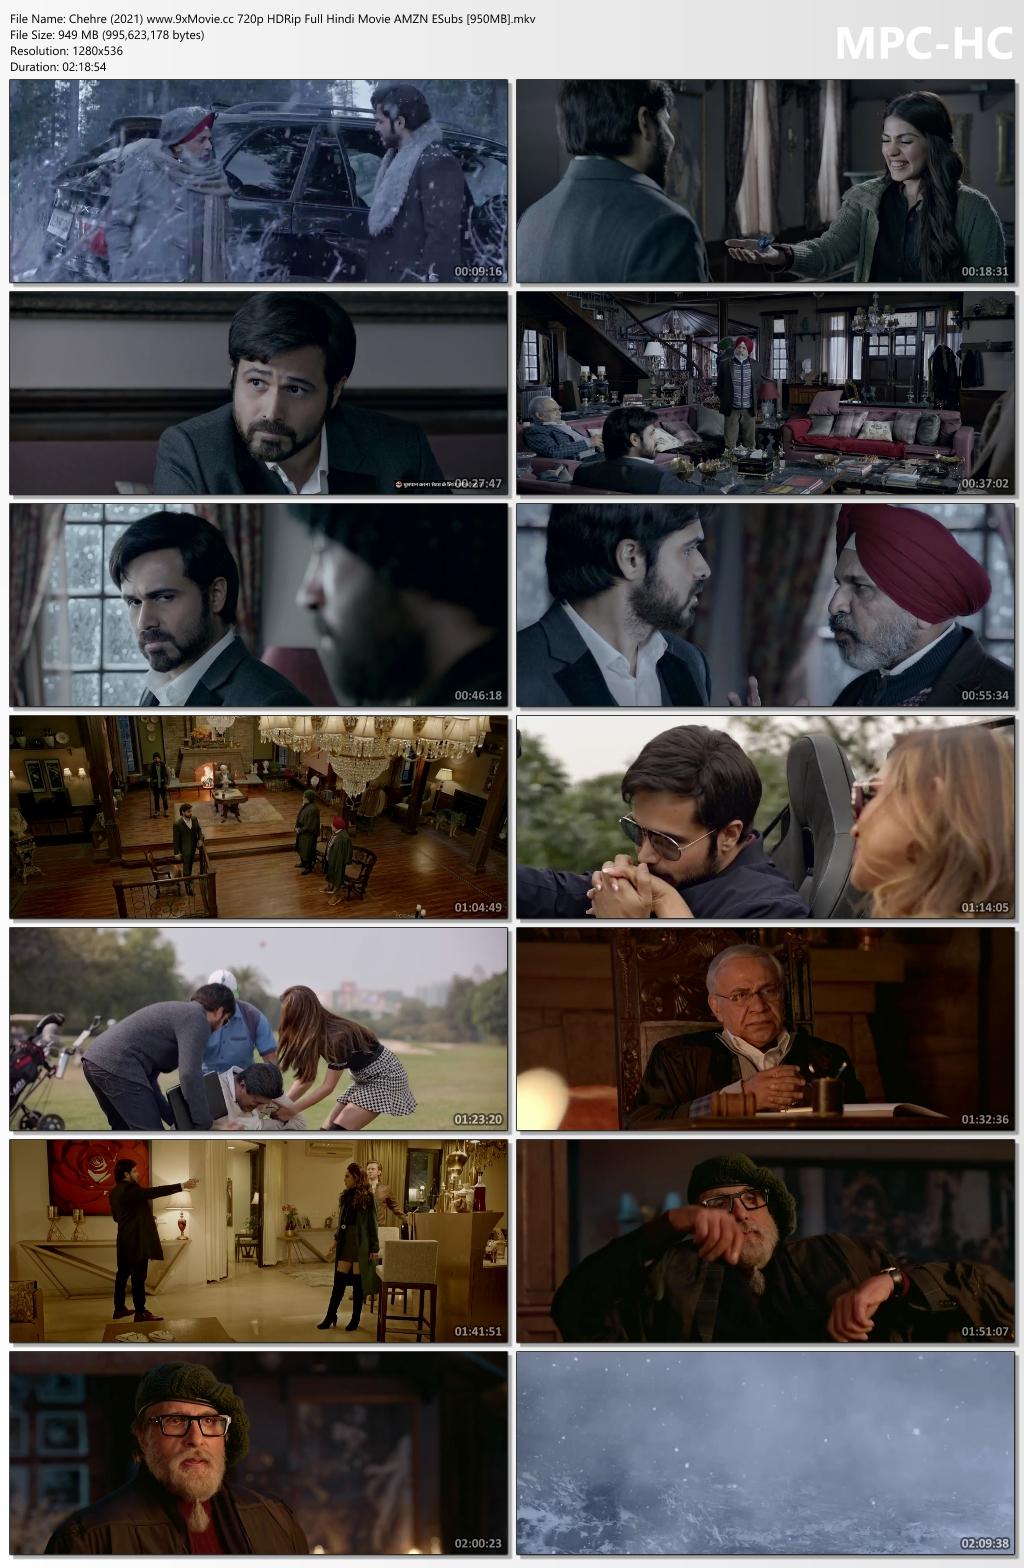 Chehre-2021-www-9x-Movie-cc-720p-HDRip-Full-Hindi-Movie-AMZN-ESubs-950-MB-mkv